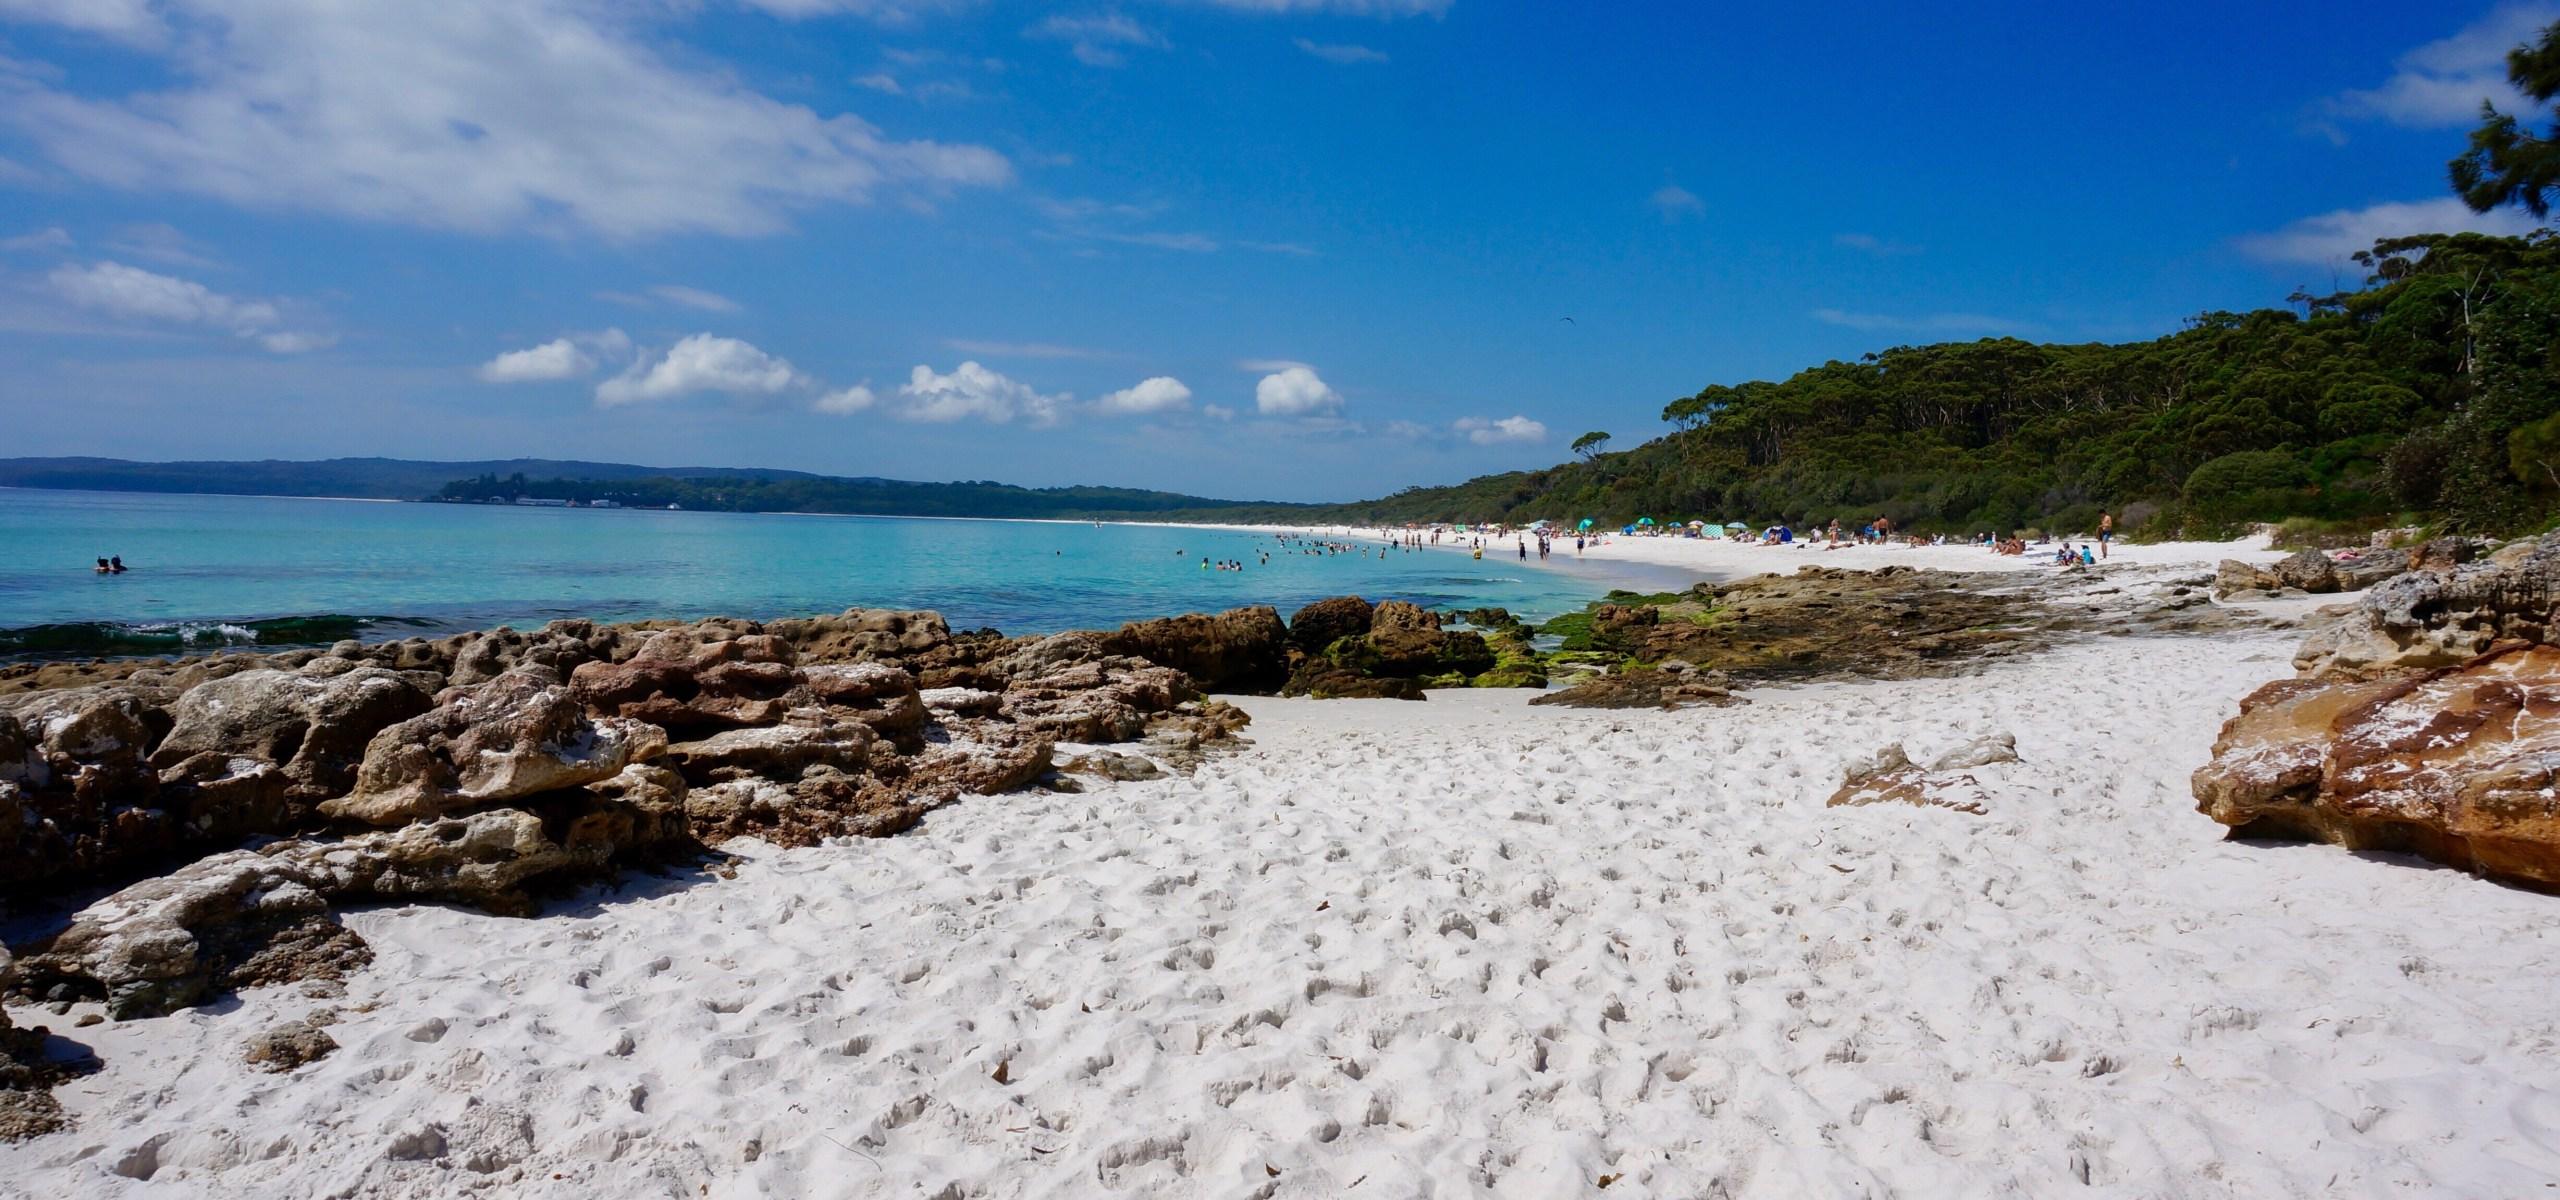 thewelltravelledman jervis bay australia